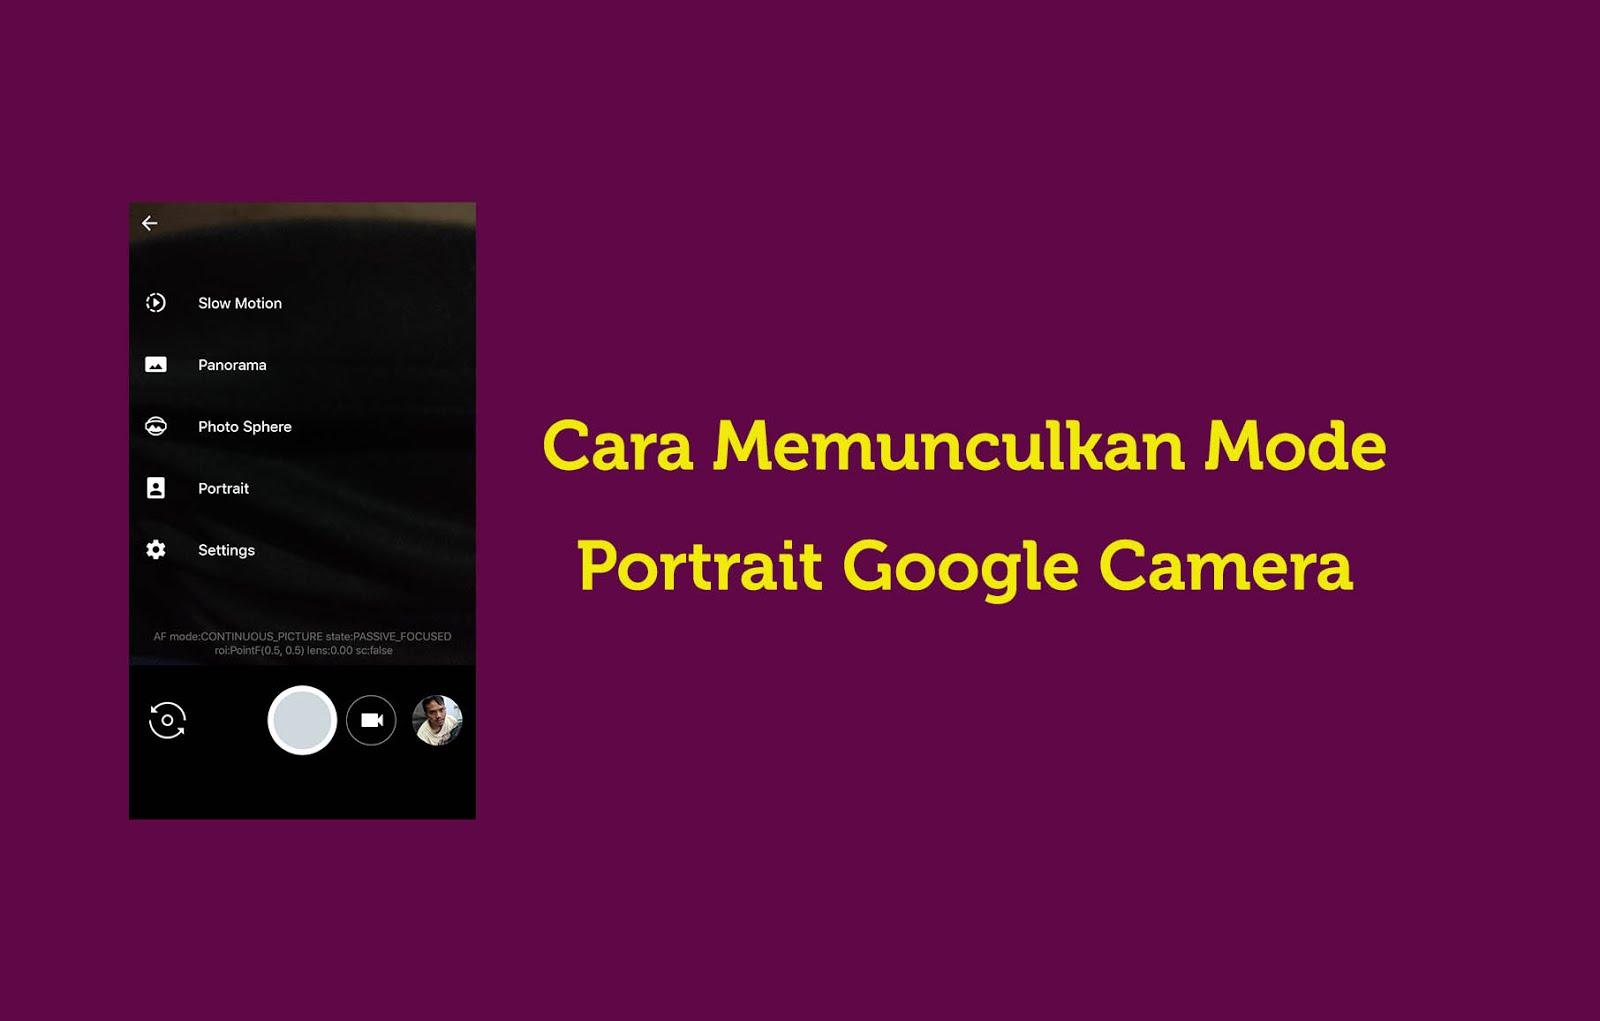 Cara Memunculkan Mode Portrait google camera